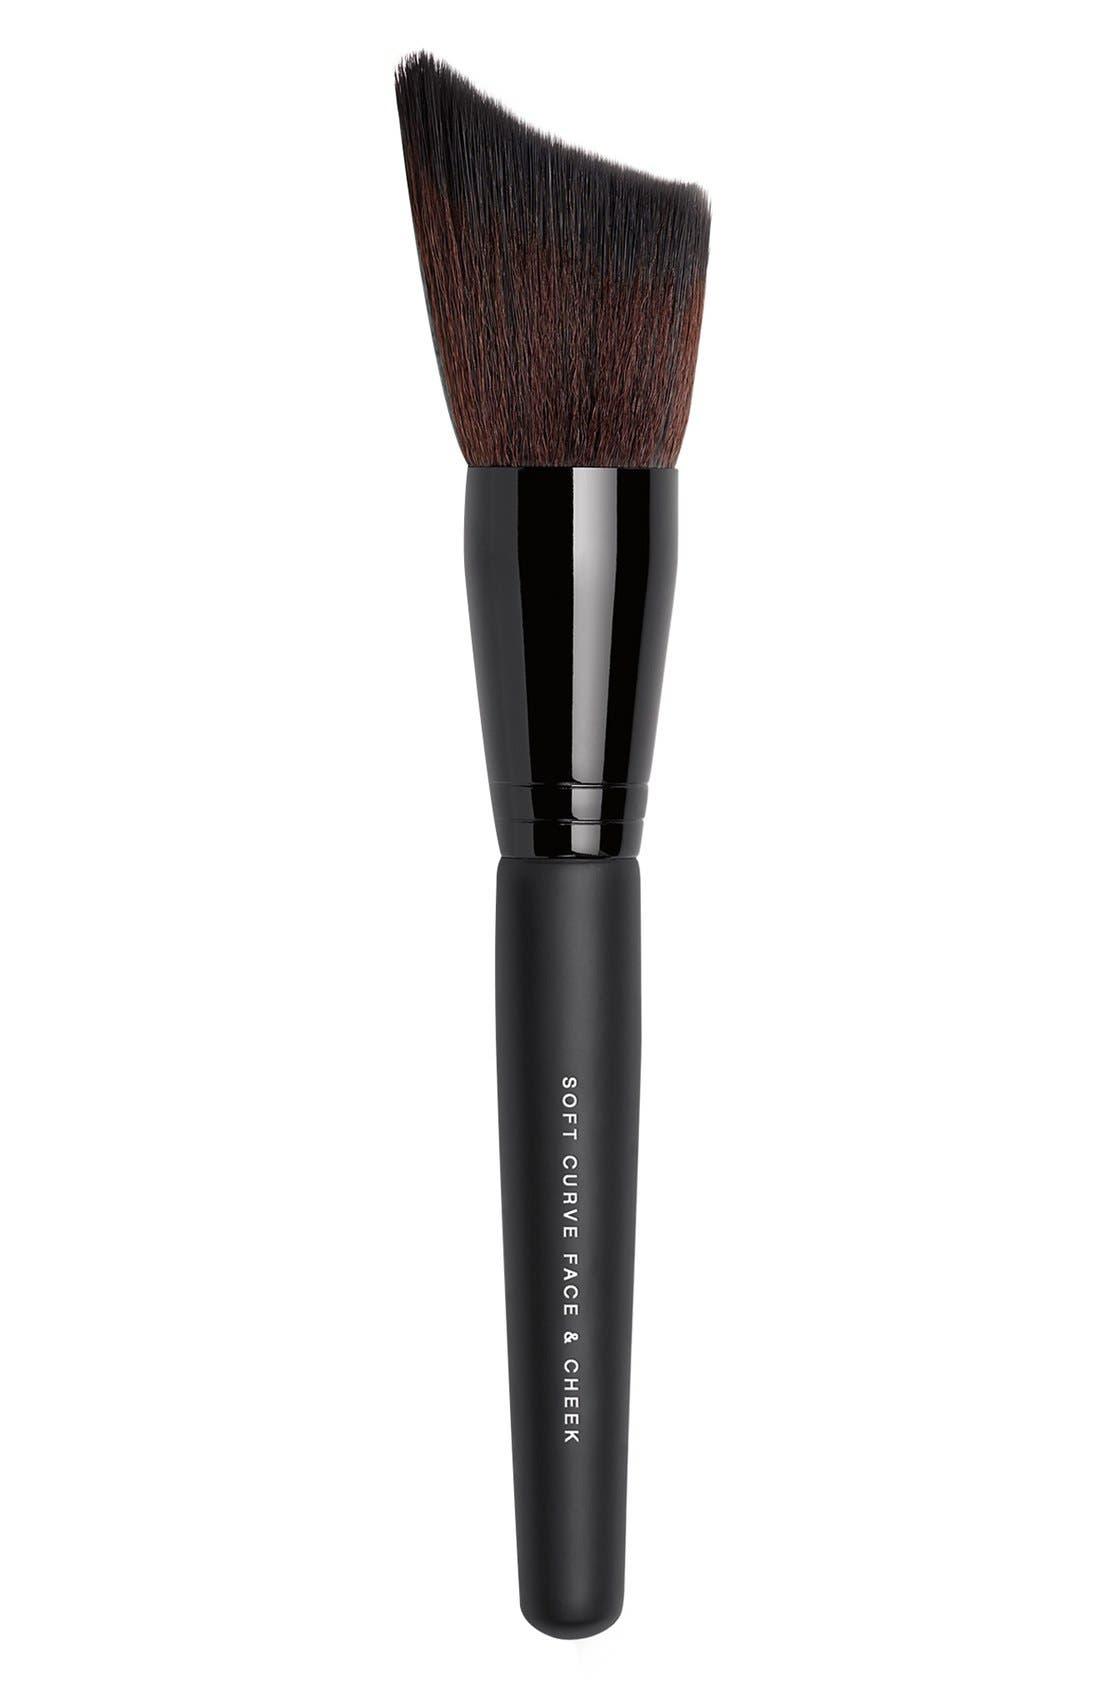 Soft Curve Face & Cheek Brush,                             Main thumbnail 1, color,                             NO COLOR